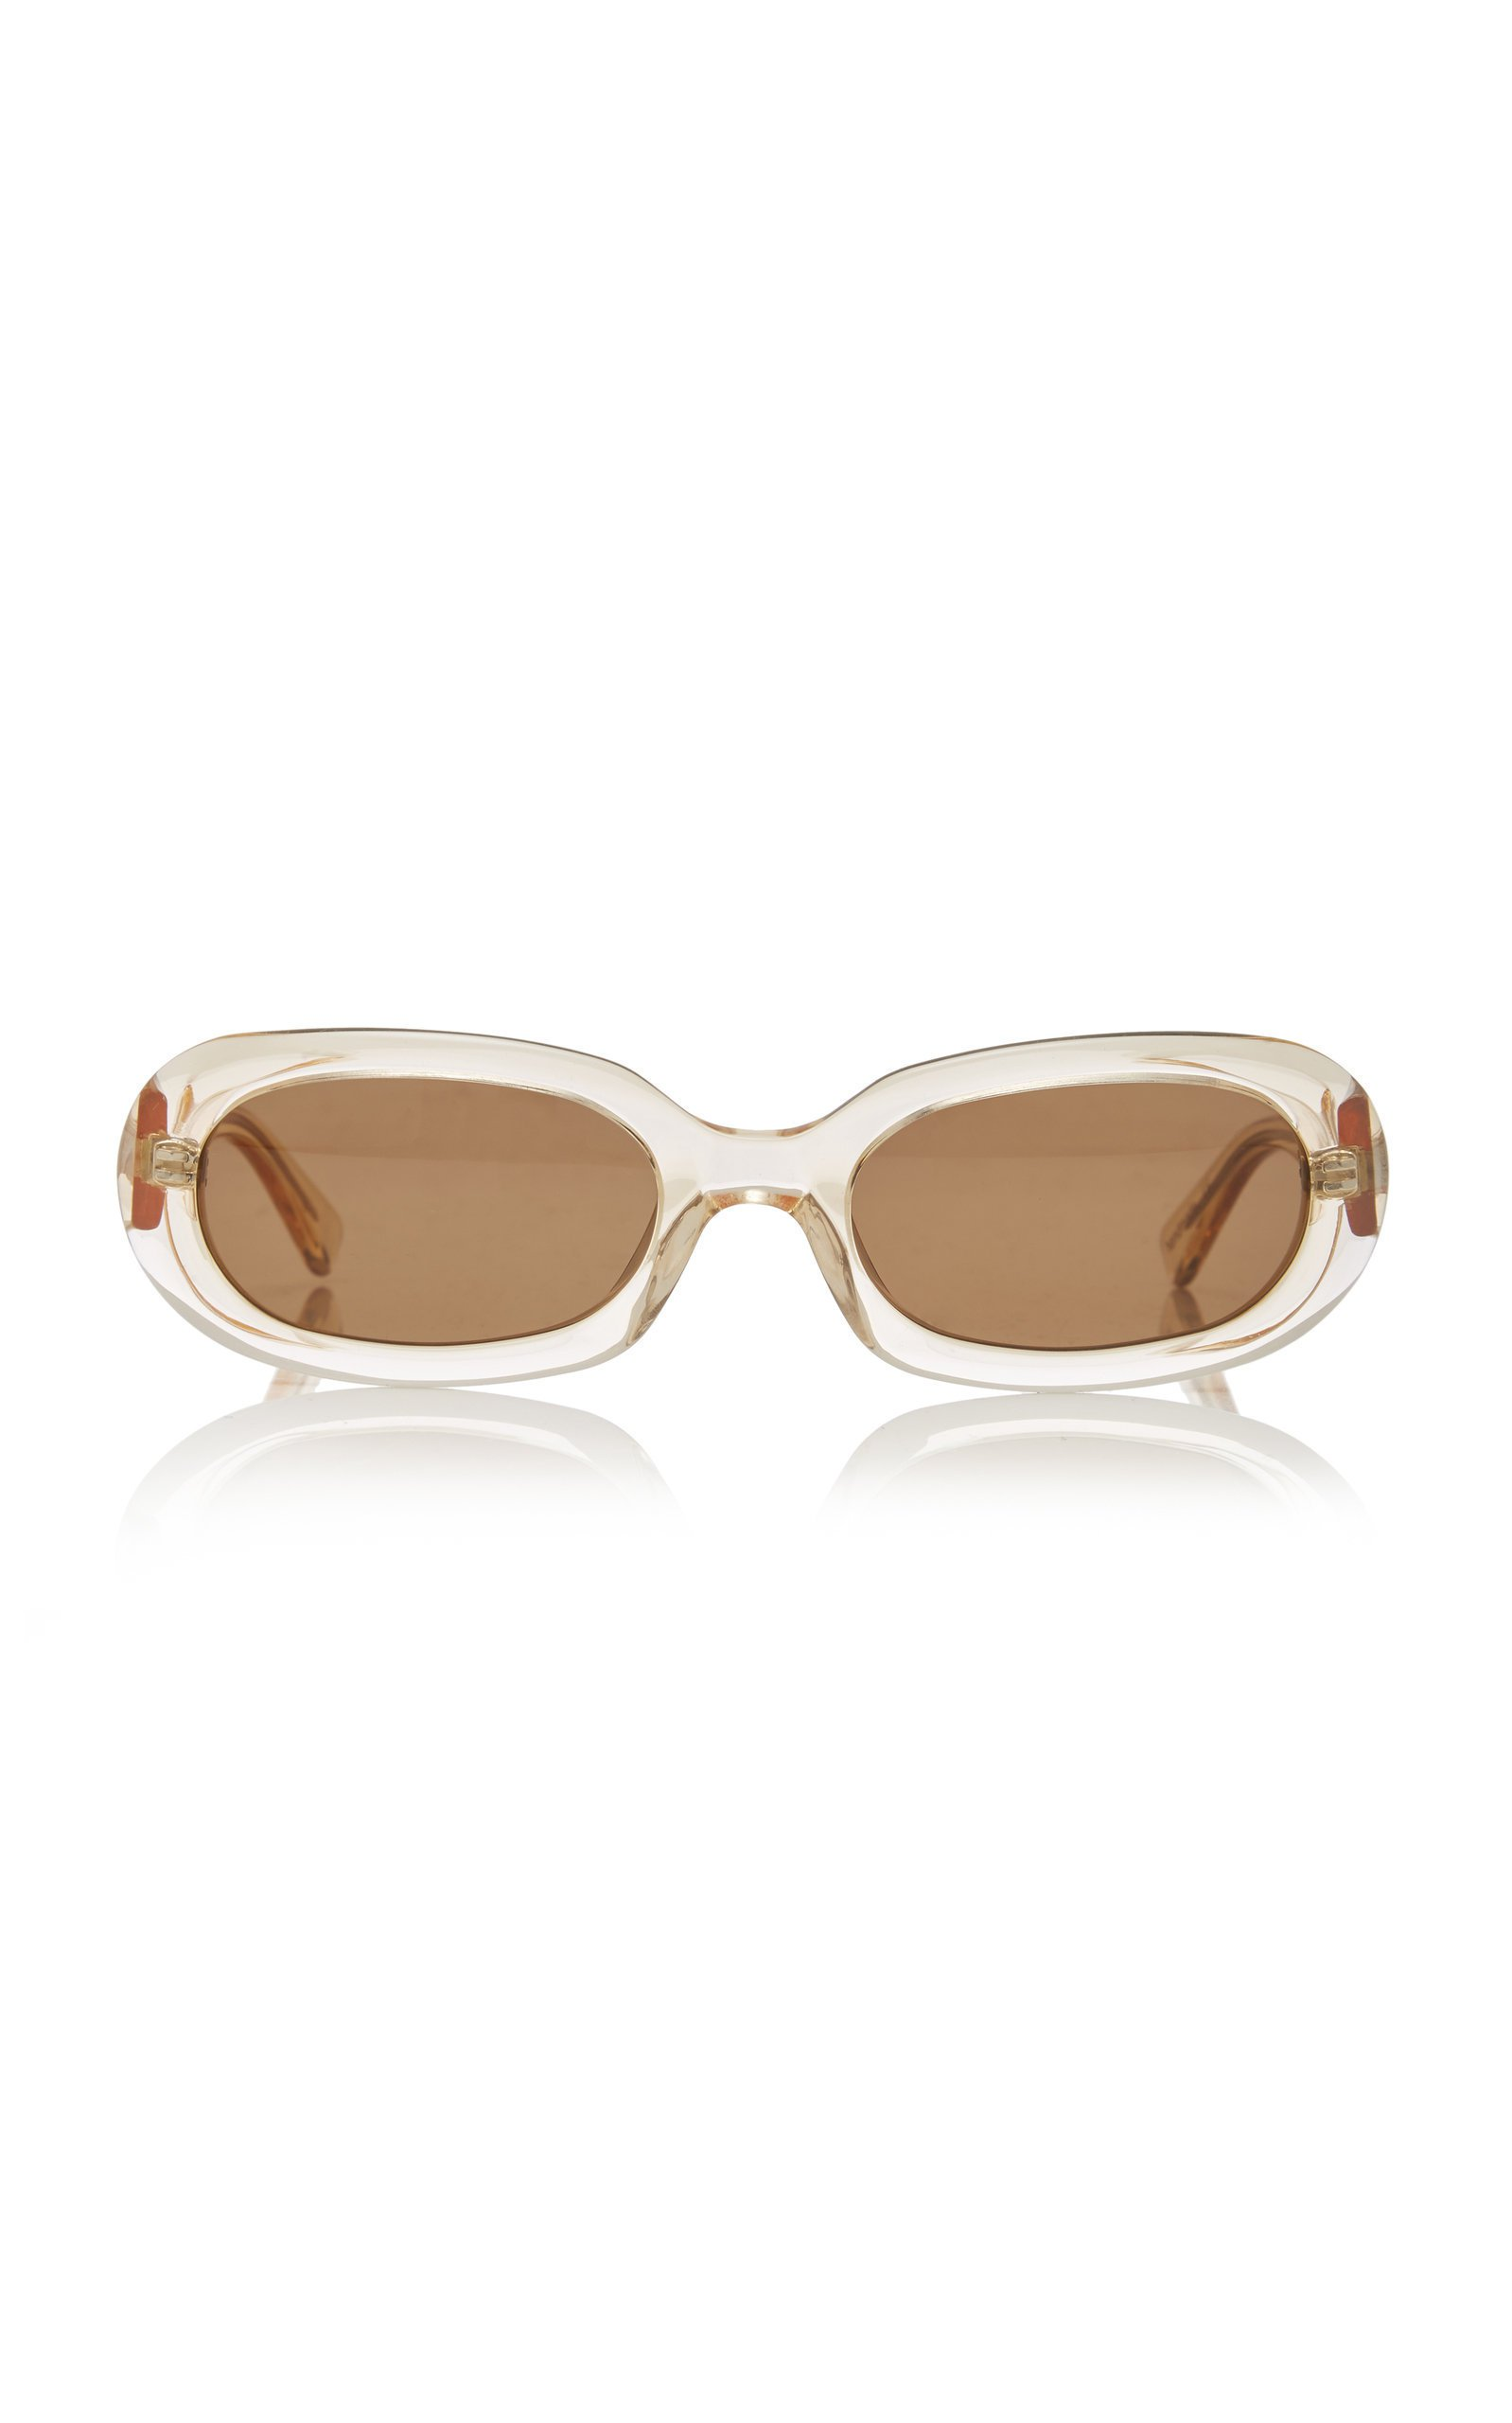 POMS Retta Oval-Frame Tortoiseshell Acetate Sunglasses